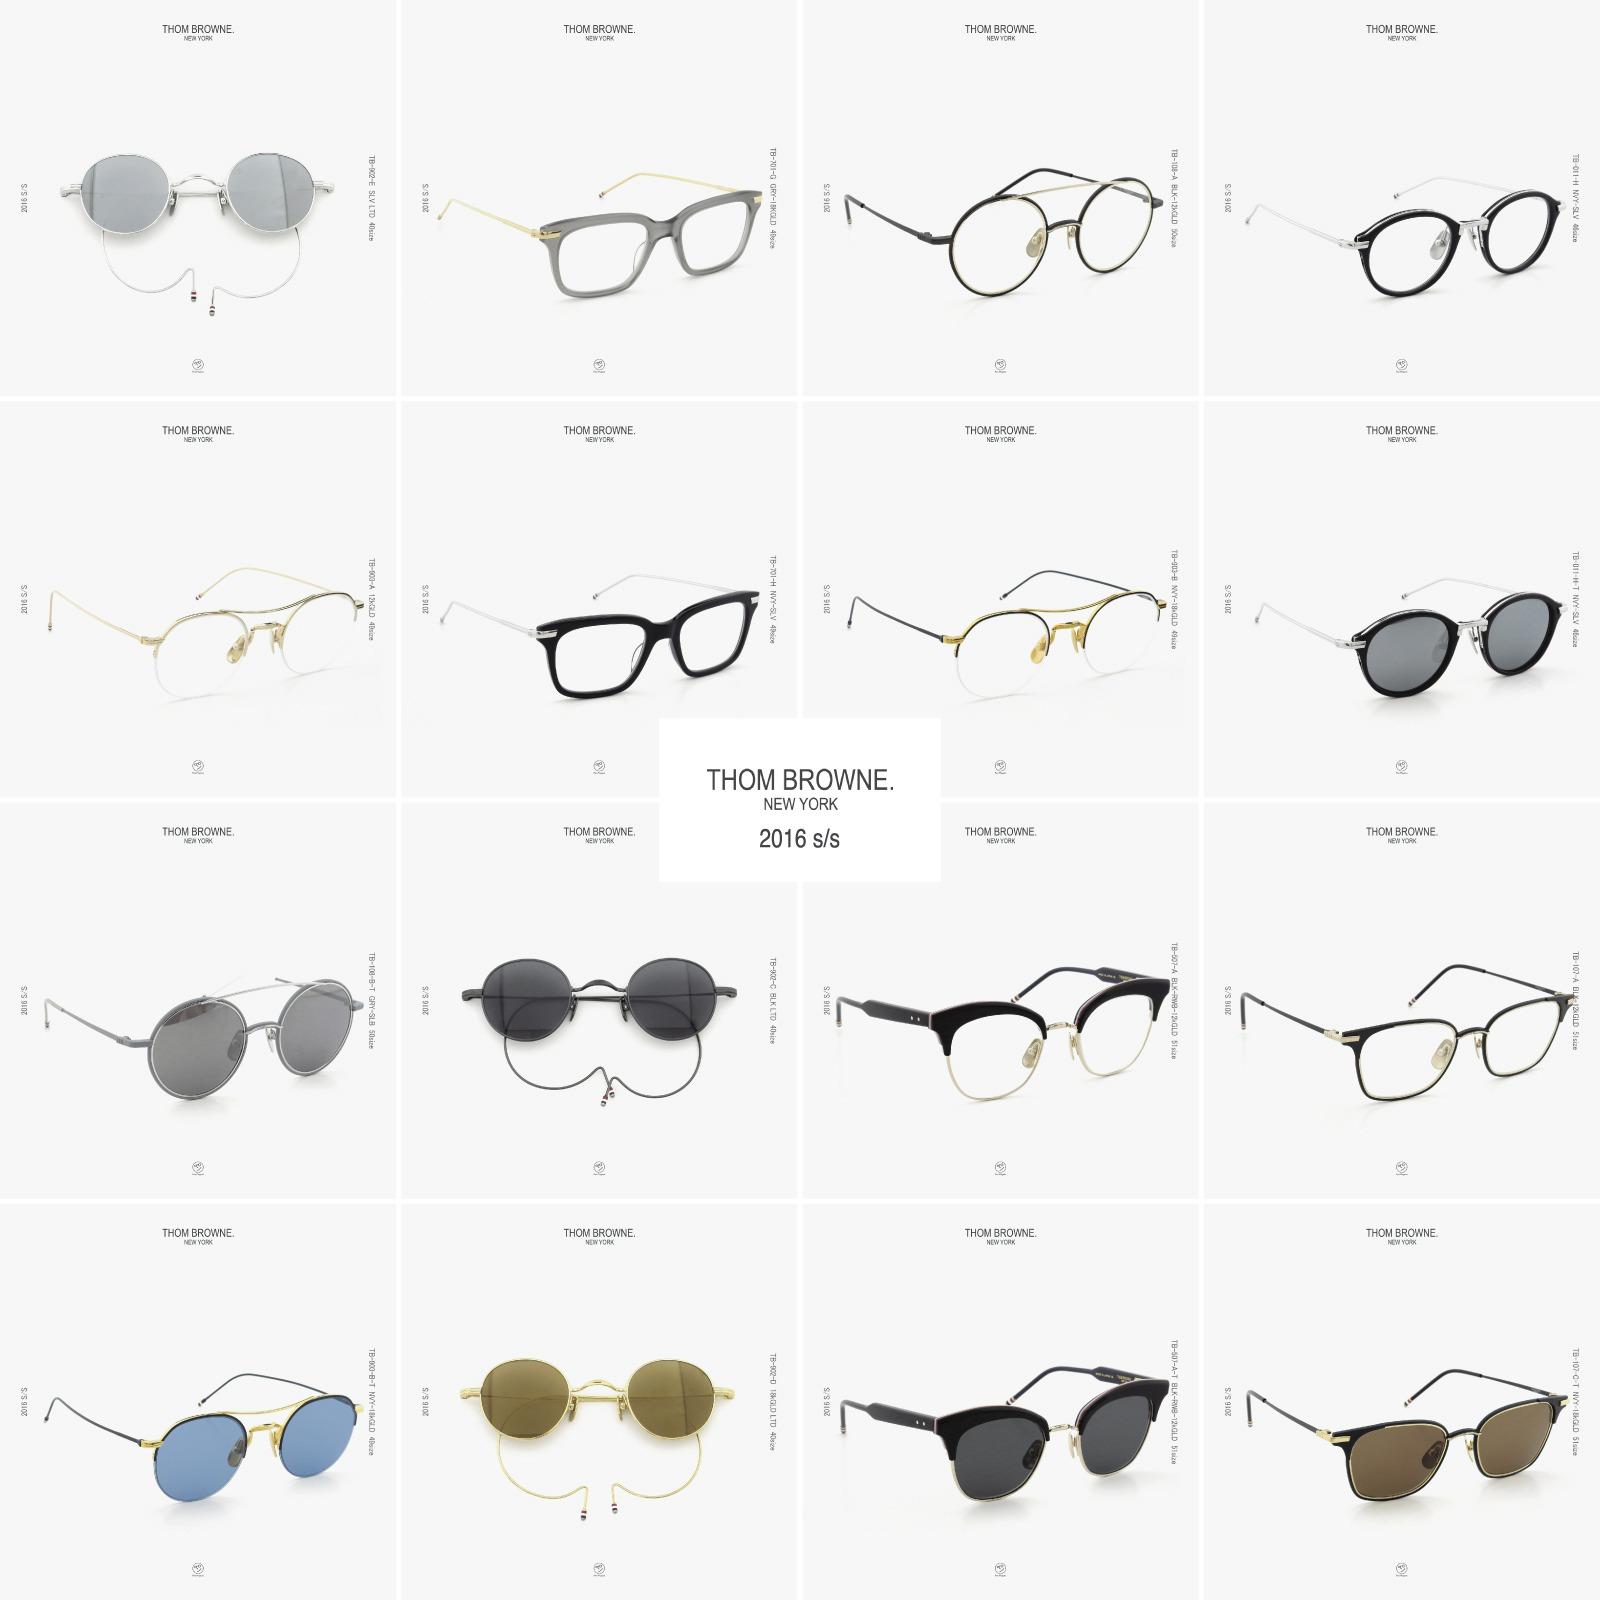 thombrowne-eyewear_2016ss-post-top